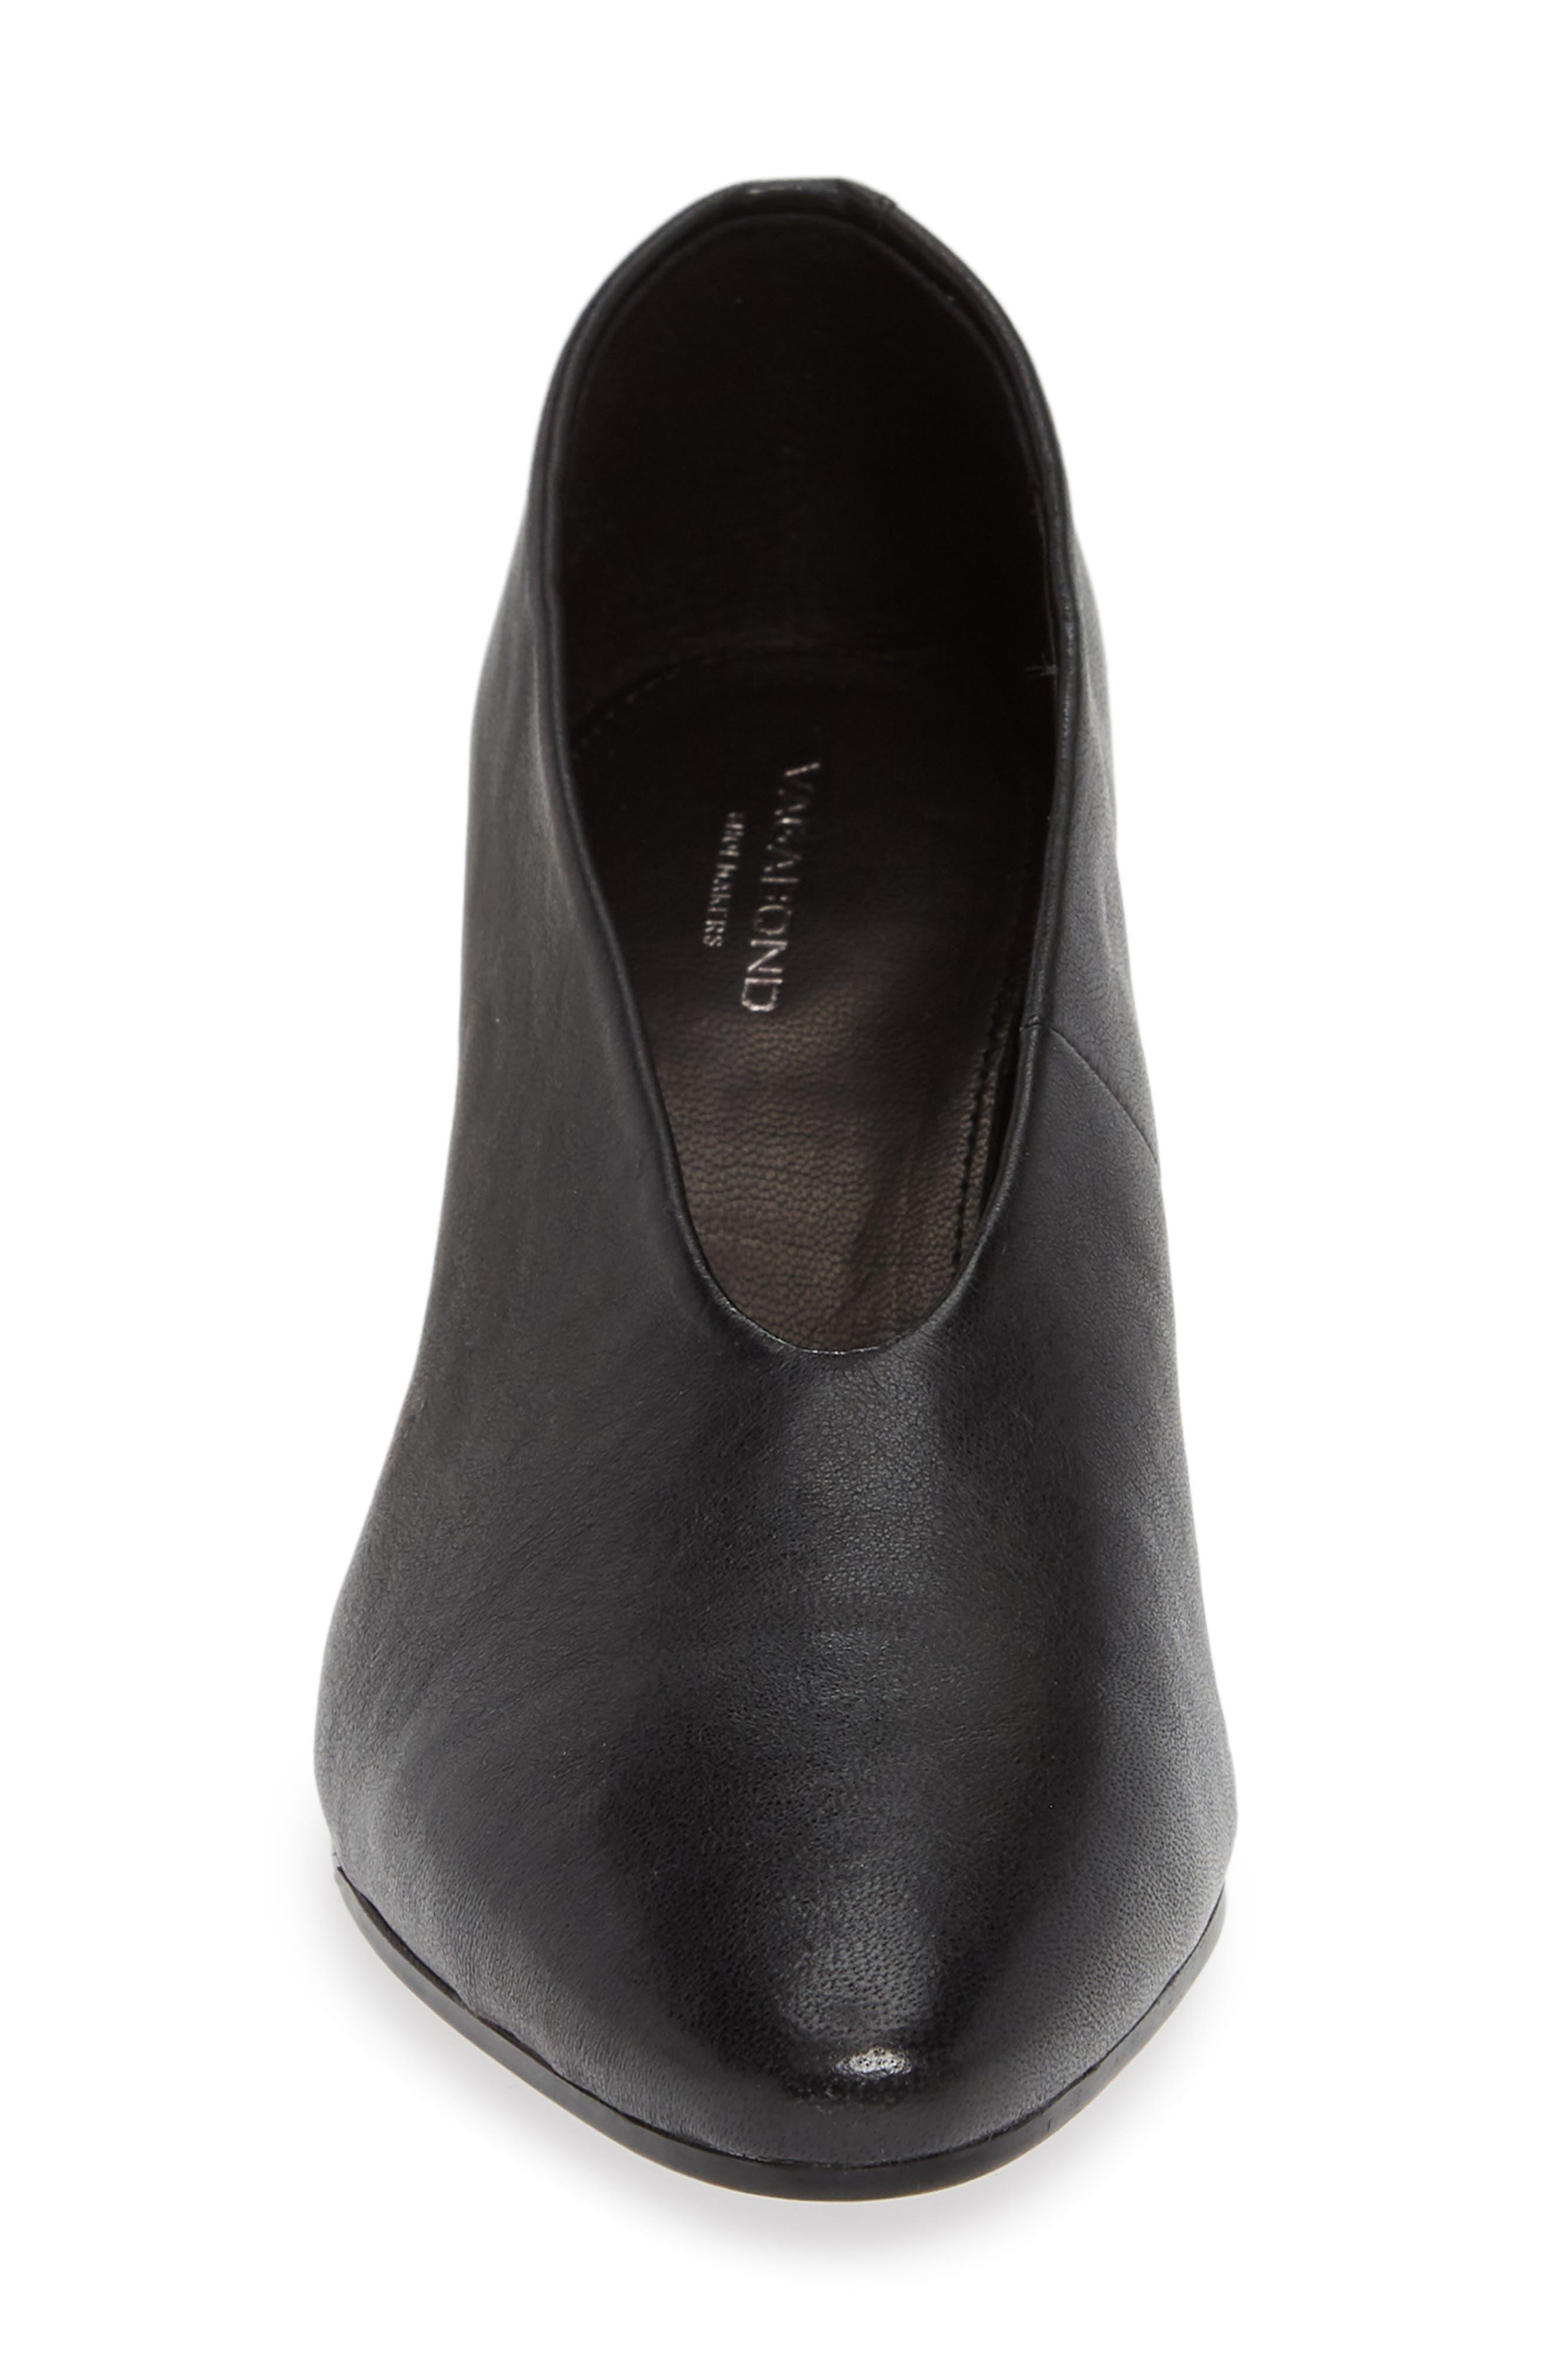 VAGABOND, Shoemakers Eve Pump, Alternate thumbnail 4, color, BLACK/ BLACK LEATHER